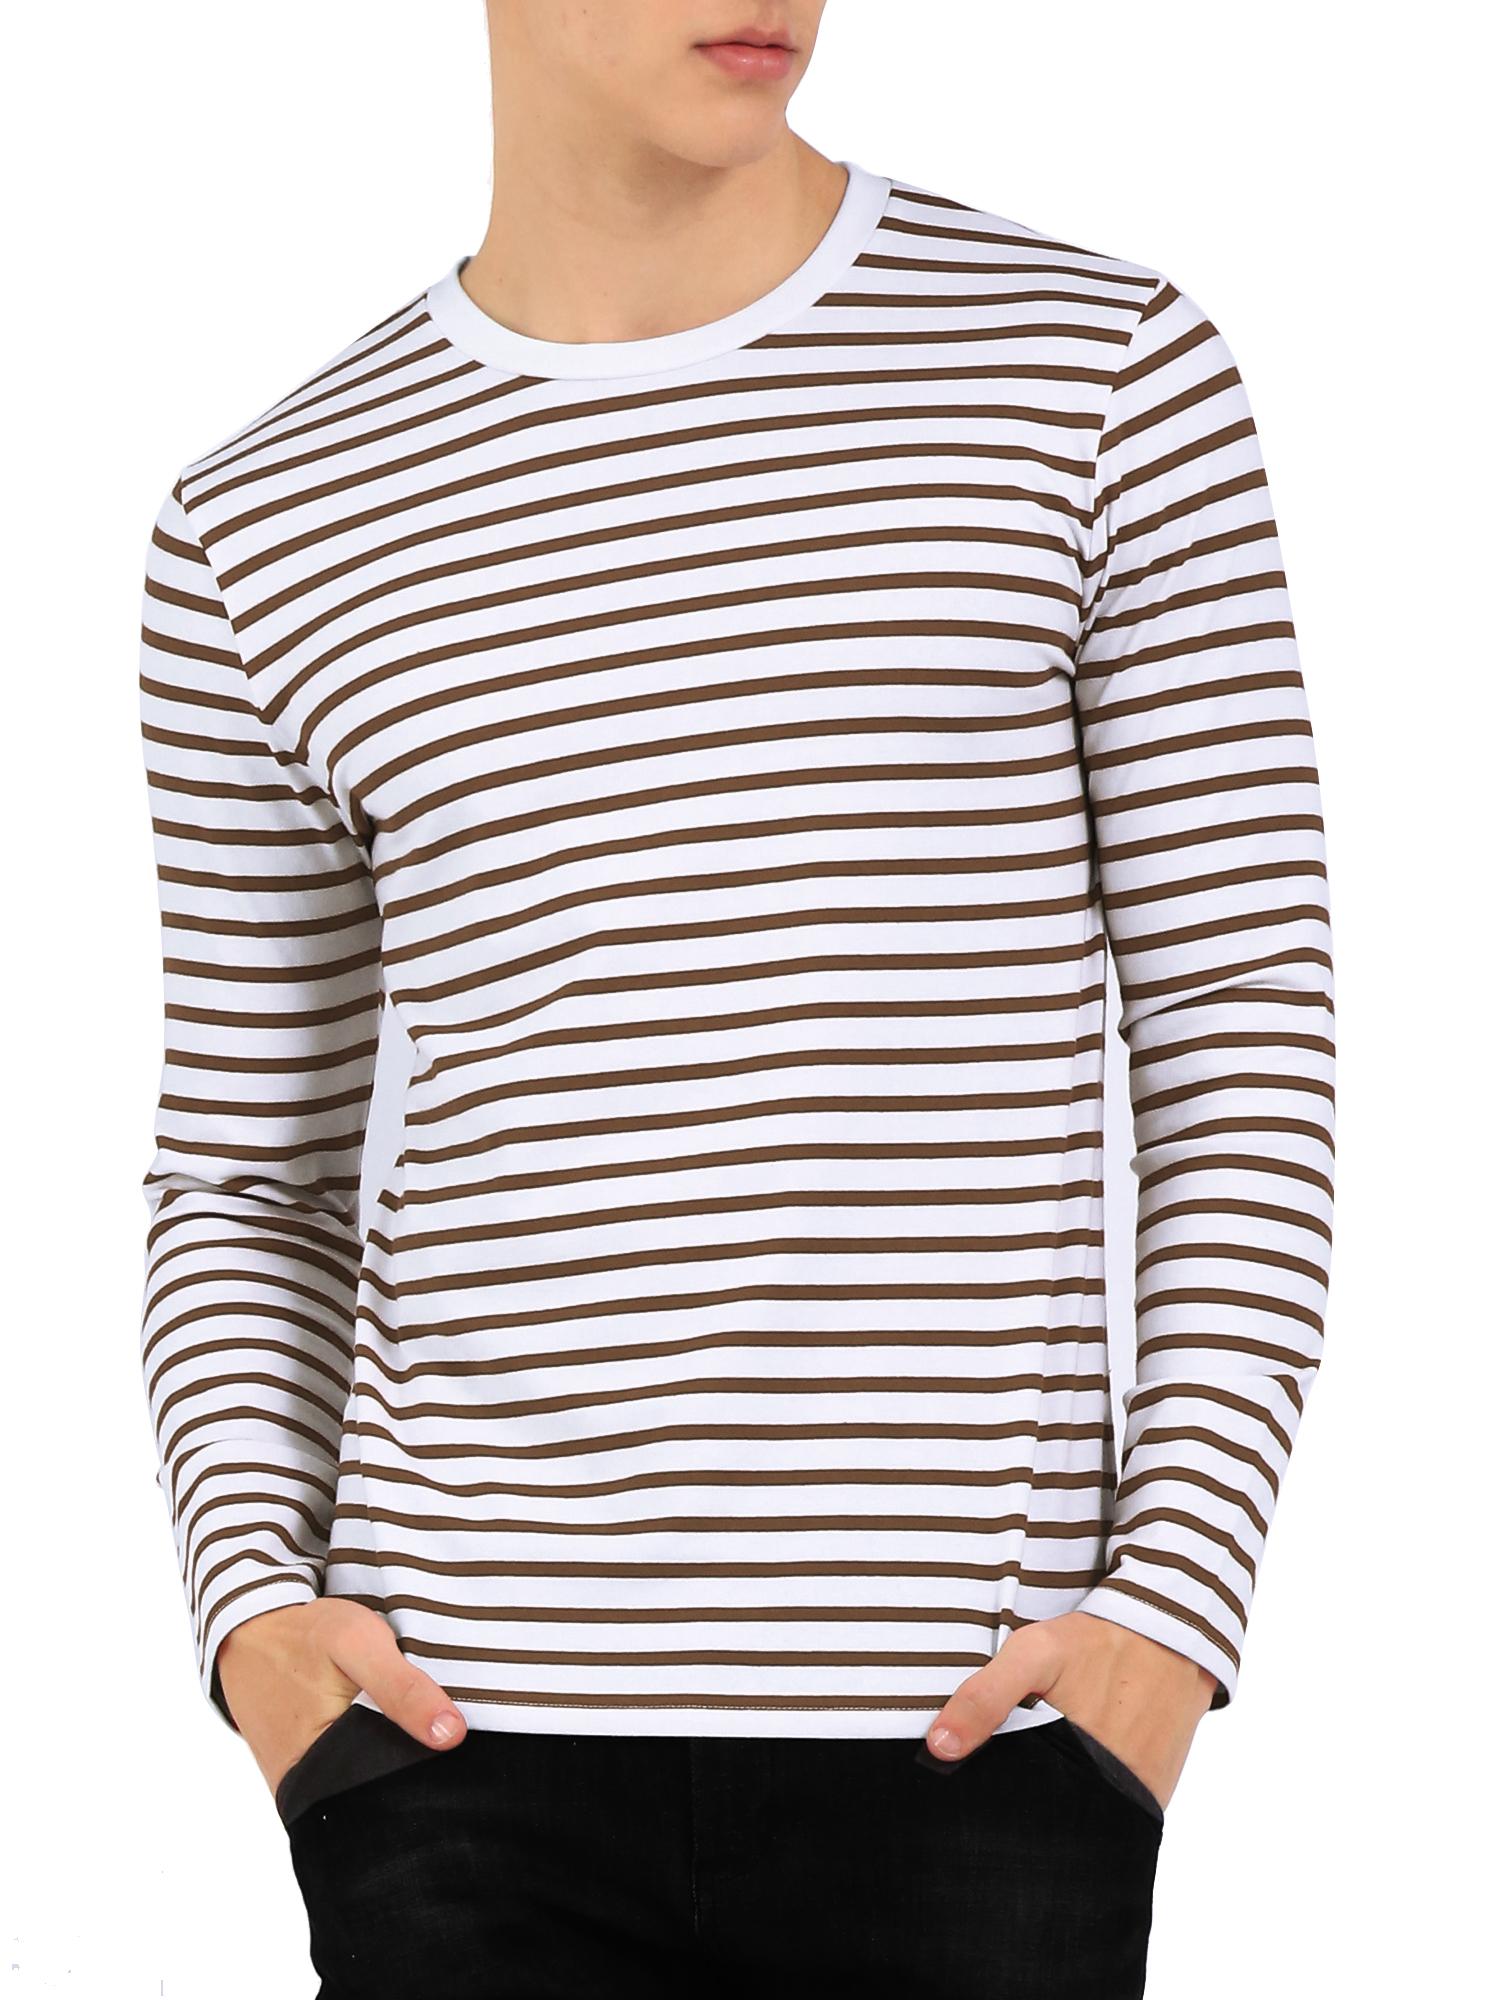 Men Crew Neck Long Sleeves Striped T-shirt Coffee/White